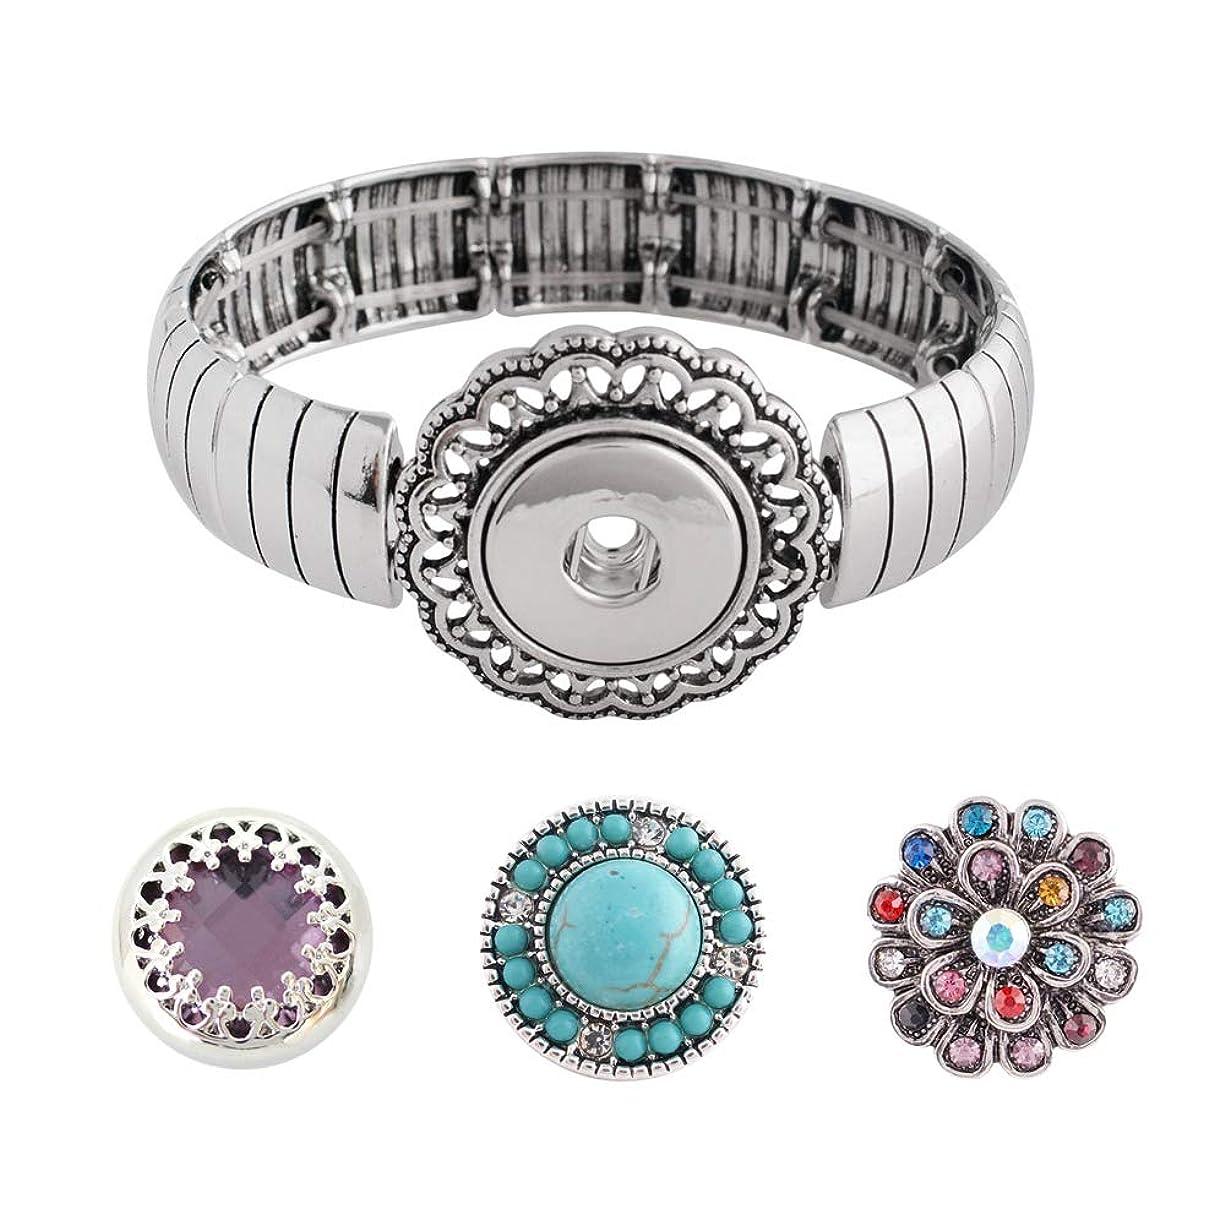 Snap Charm Metal Stretch Bracelet Includes 3 Standard Snaps Shown